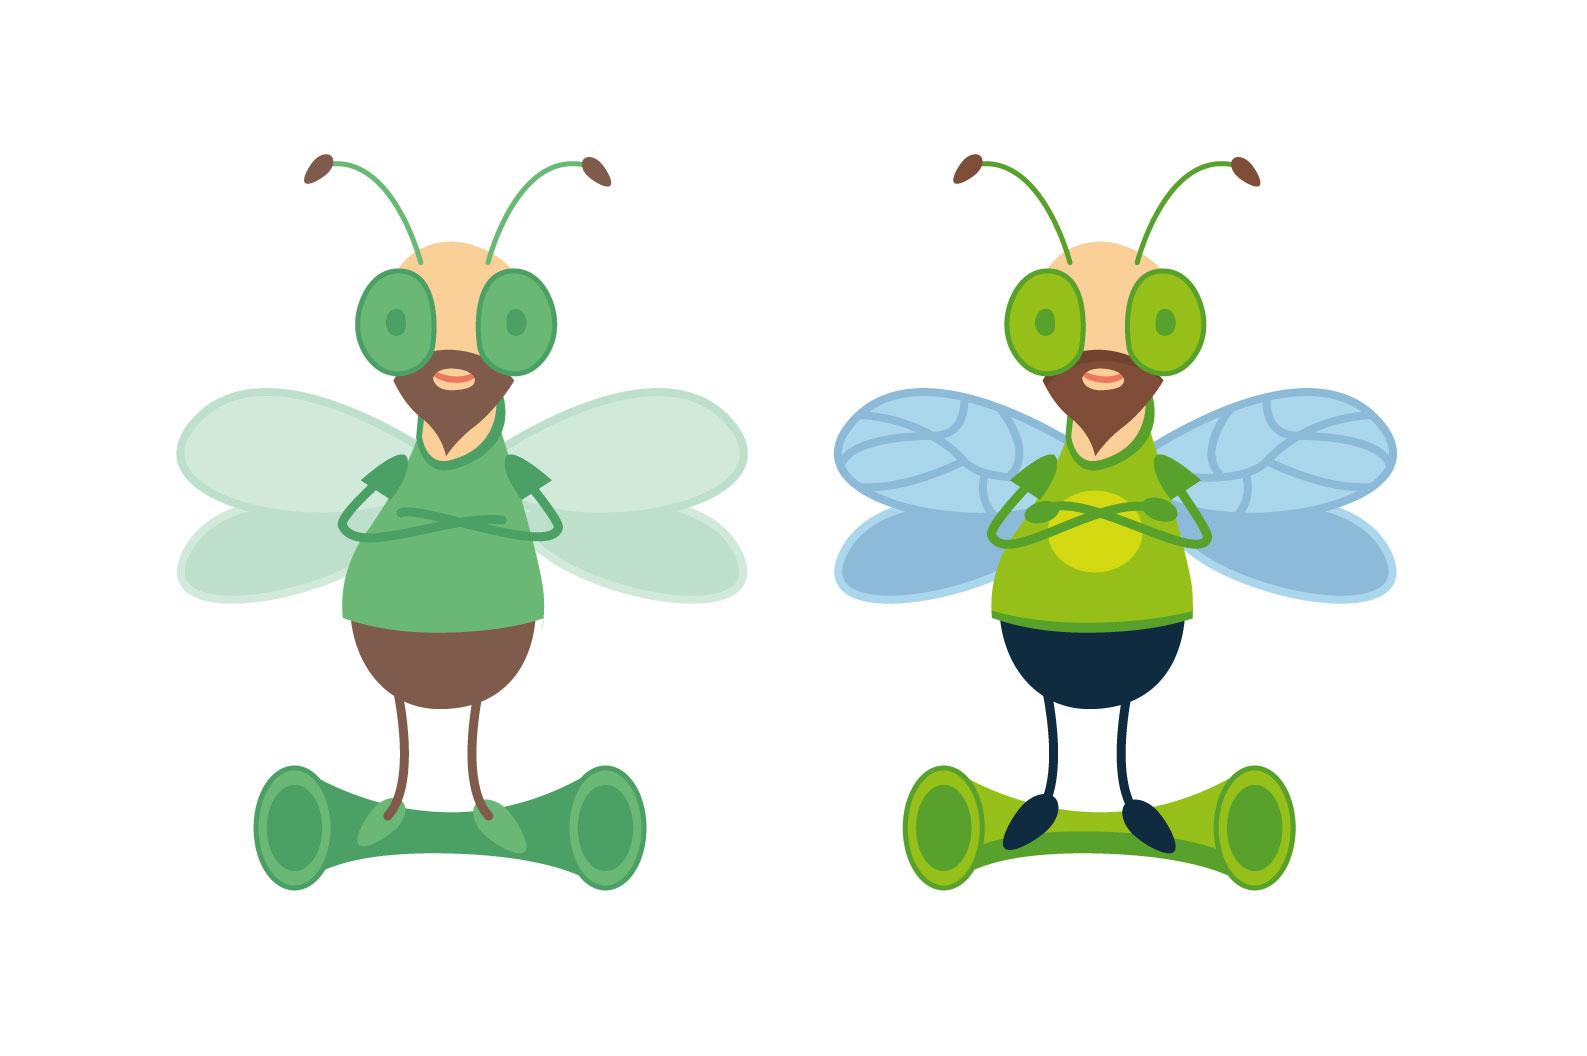 Конкурс на создание персонажа для сайта компании «Экодрифт» фото f_51859dfc196eb87d.jpg